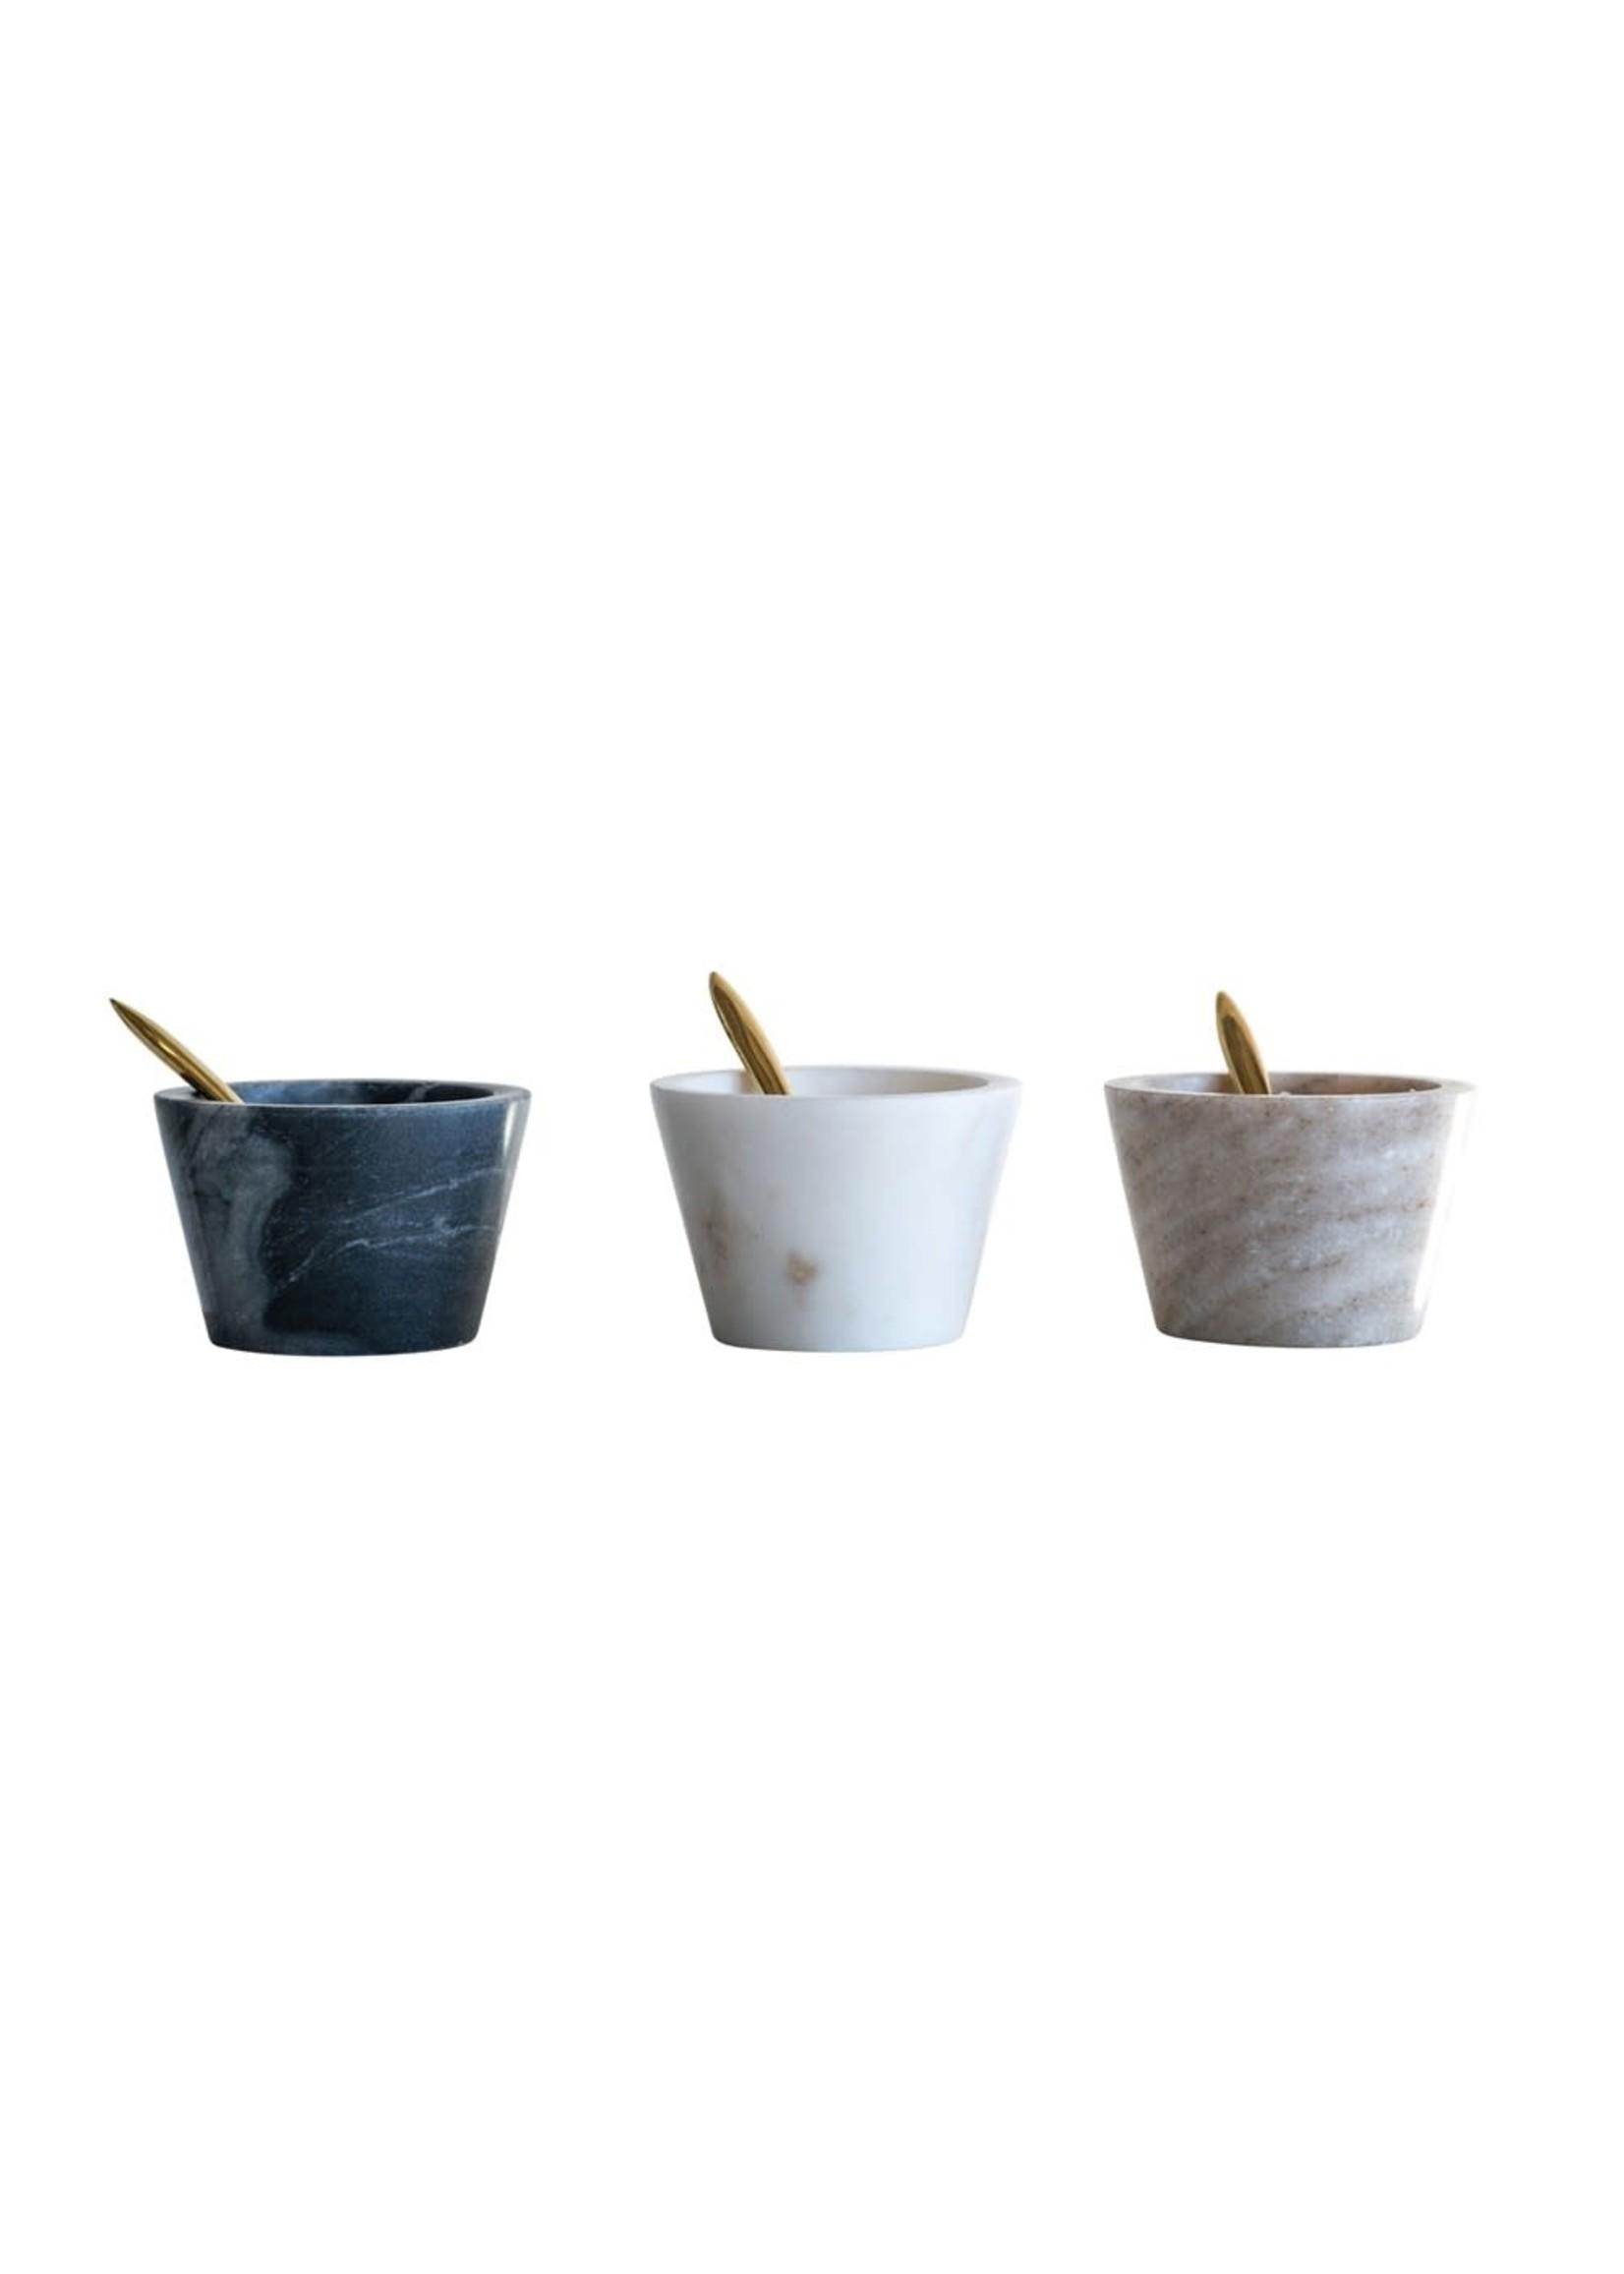 Marble bowls set of 3 W/antique spoon black/cream/sand